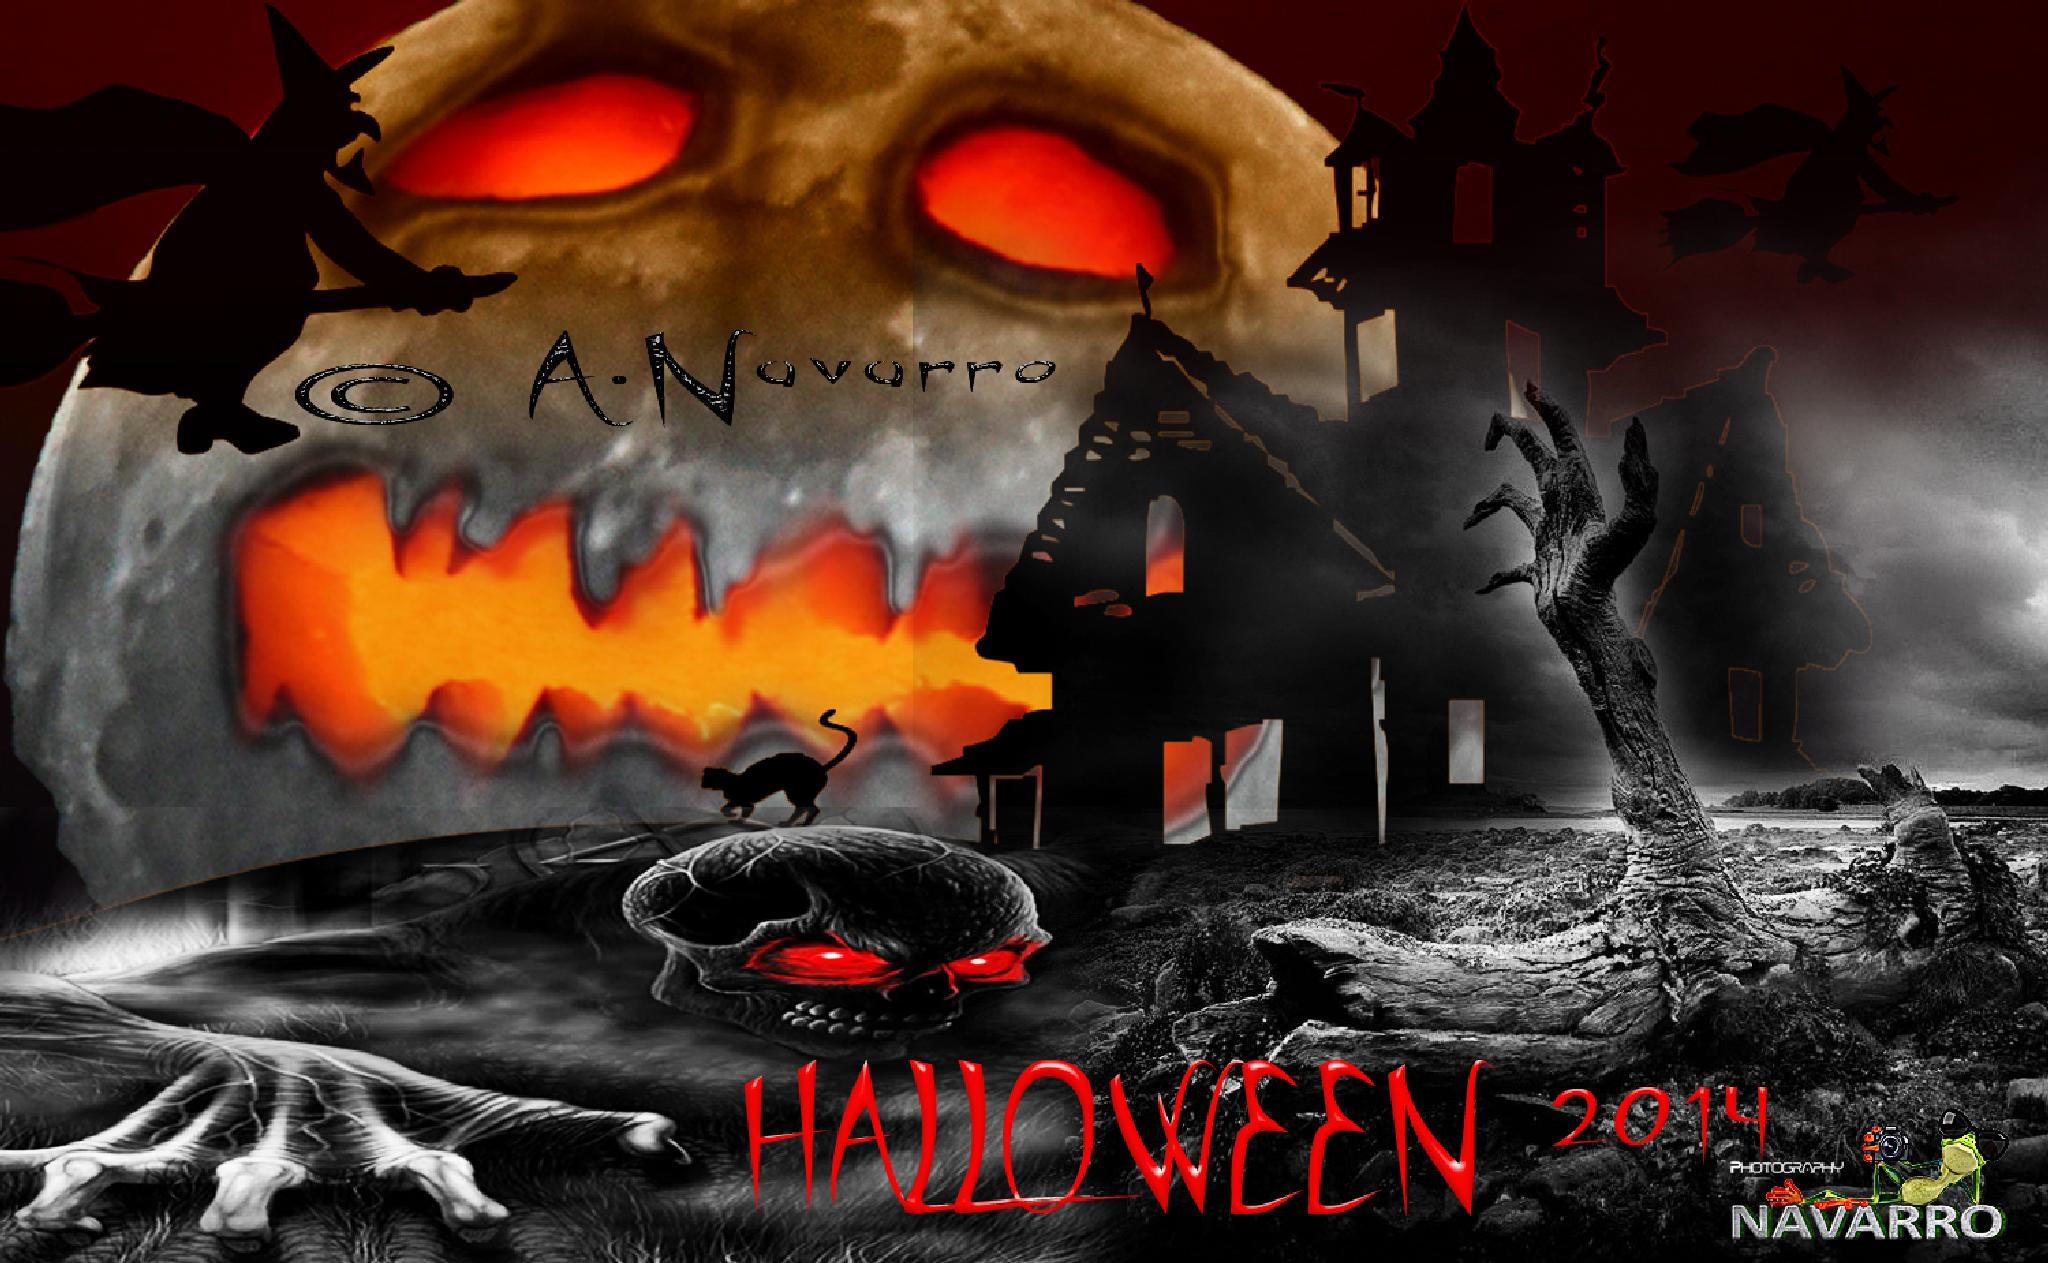 Halloween 2014 by A.Navarro